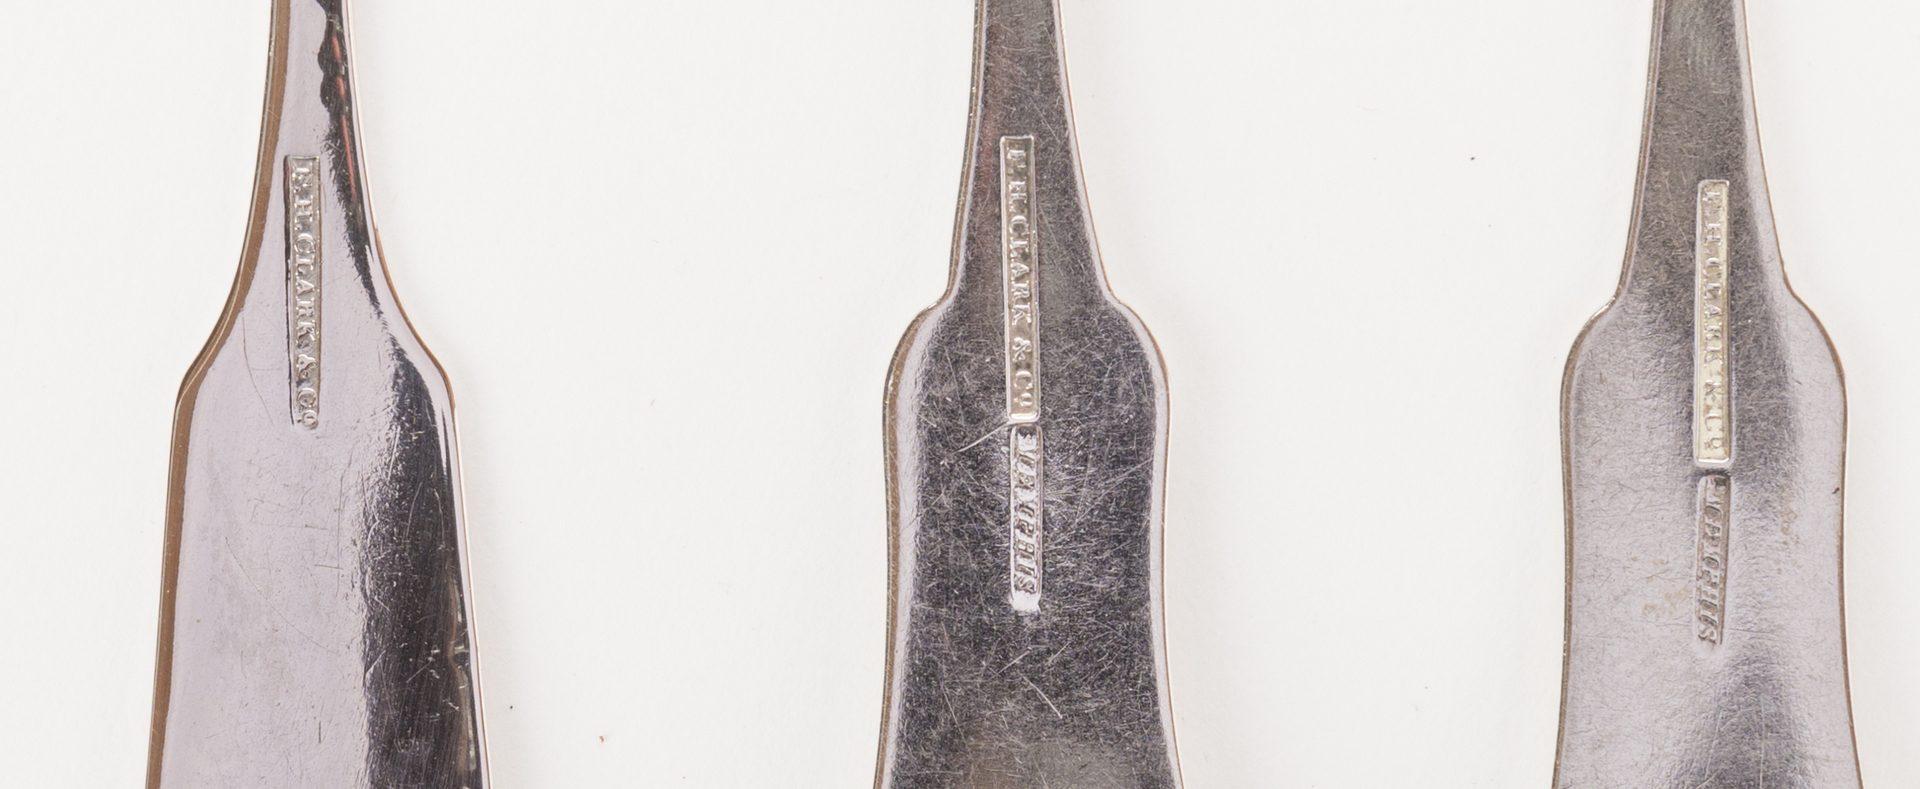 Lot 265: 10 pcs Memphis Coin Silver Flatware